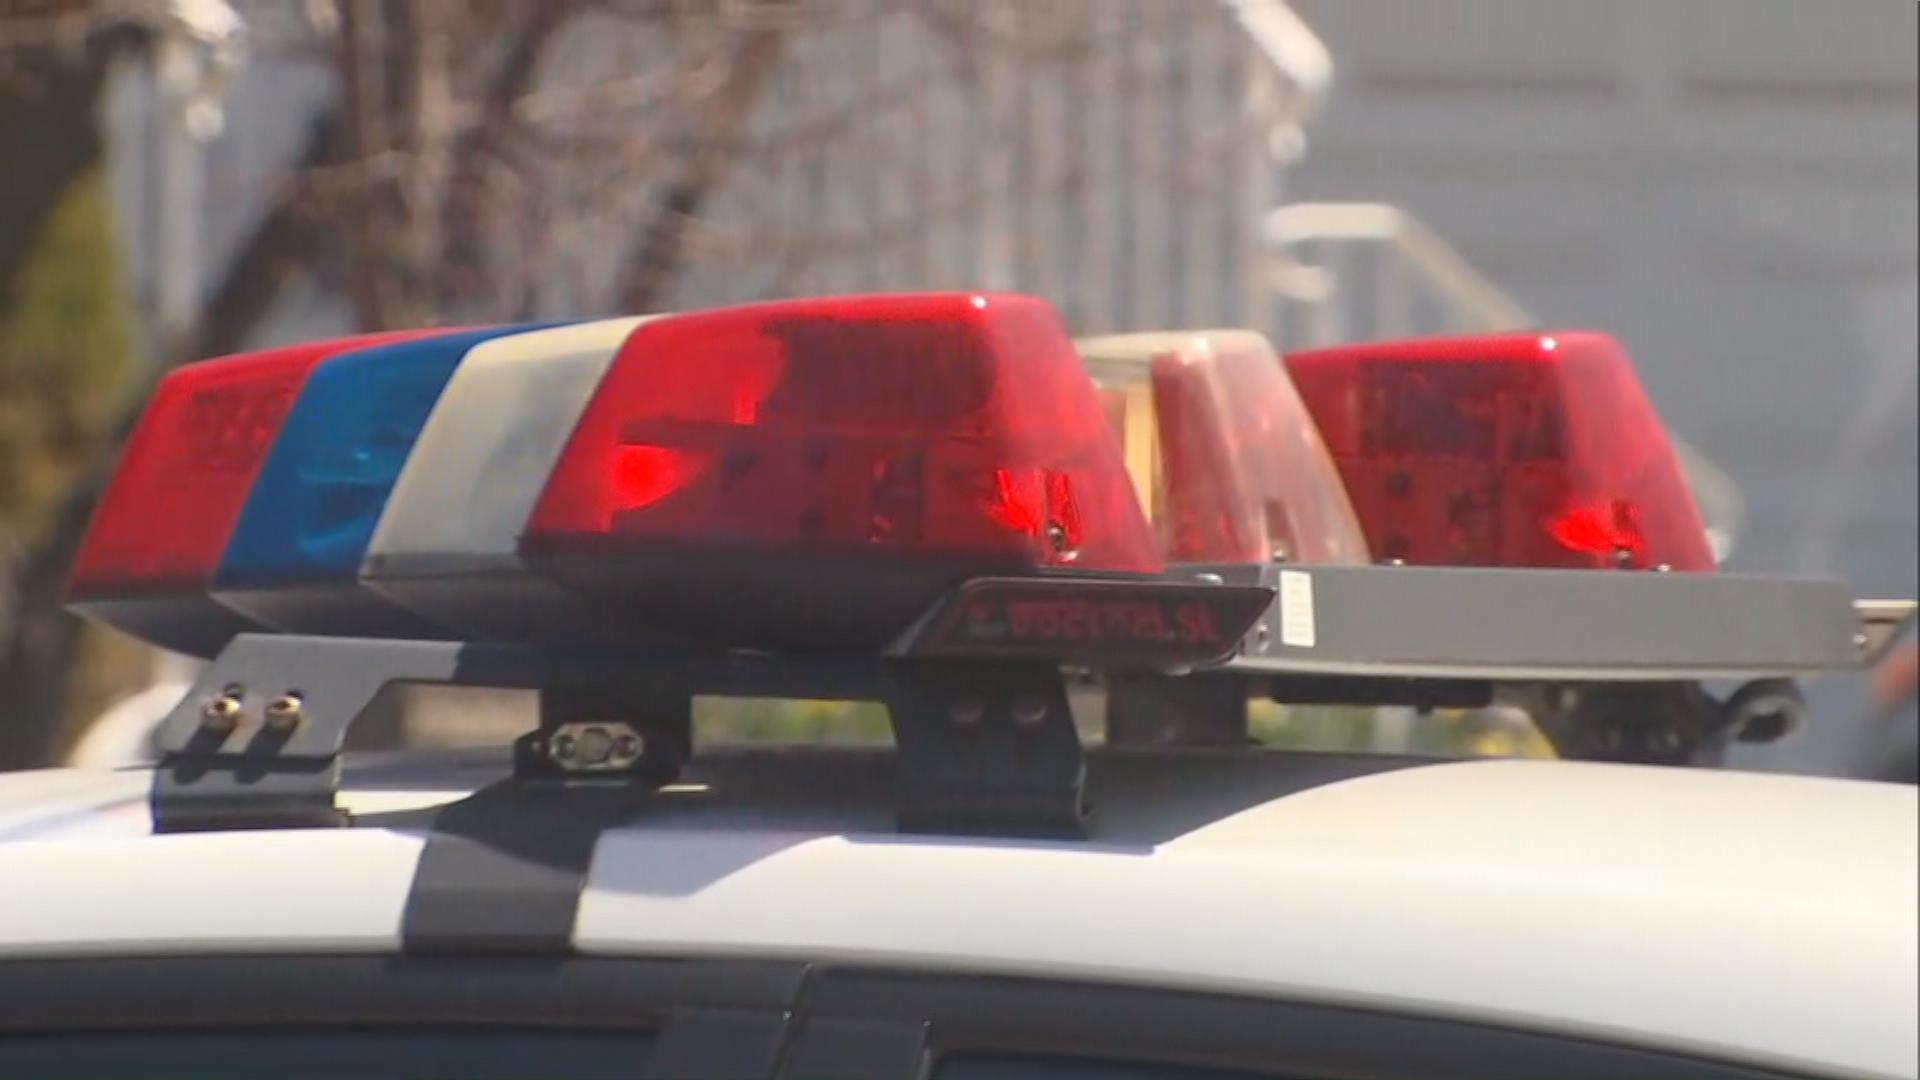 6-Year-Old Girl Among 3 From NJ Family Killed in VA Crash